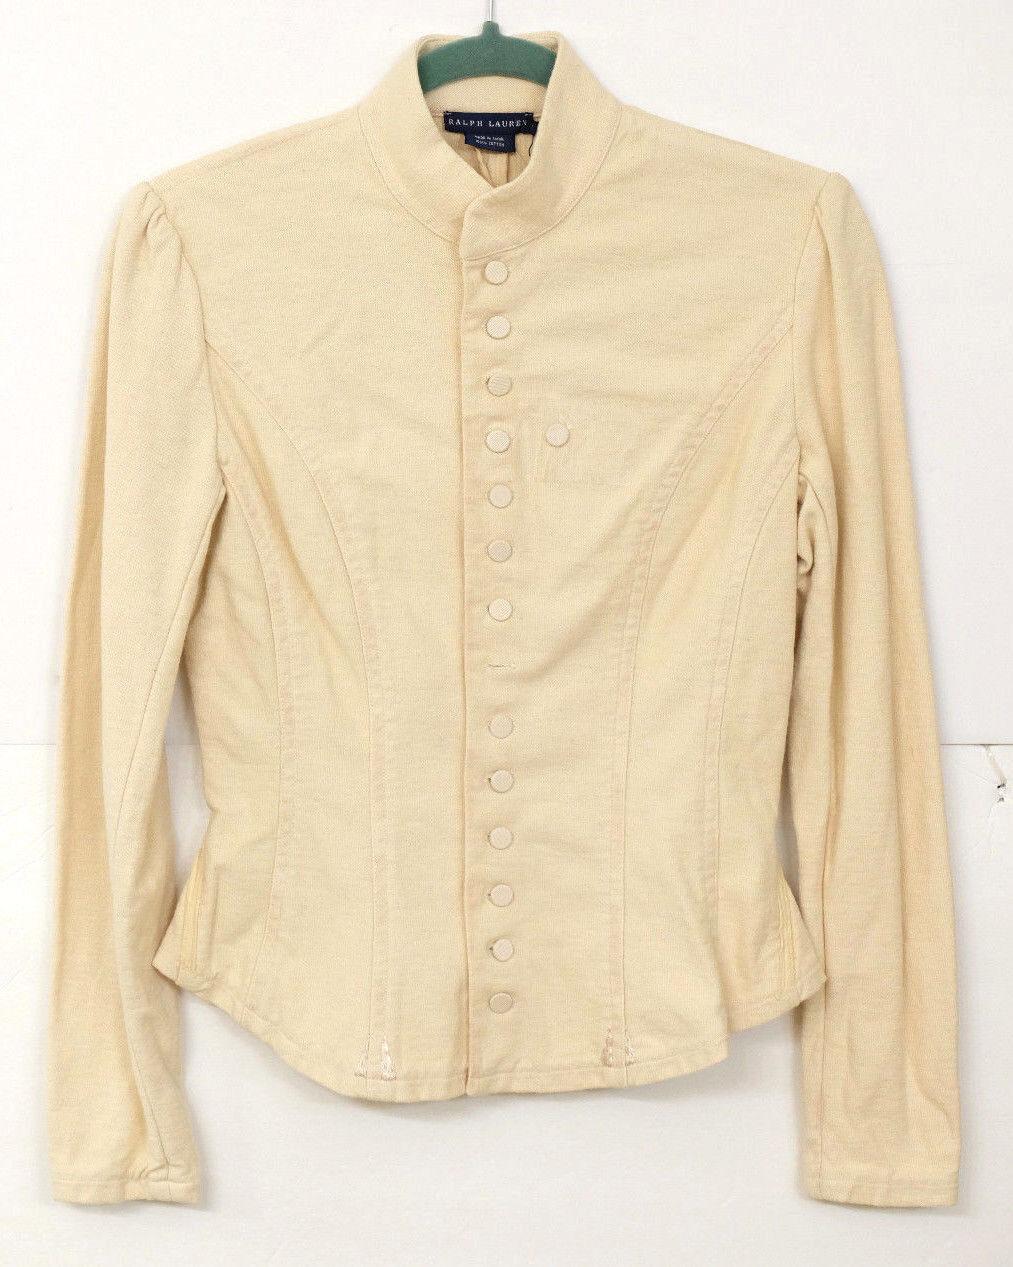 NWT Ralph Lauren bluee Label Women's Size M Long Sleeve Cotton Blazer  MS